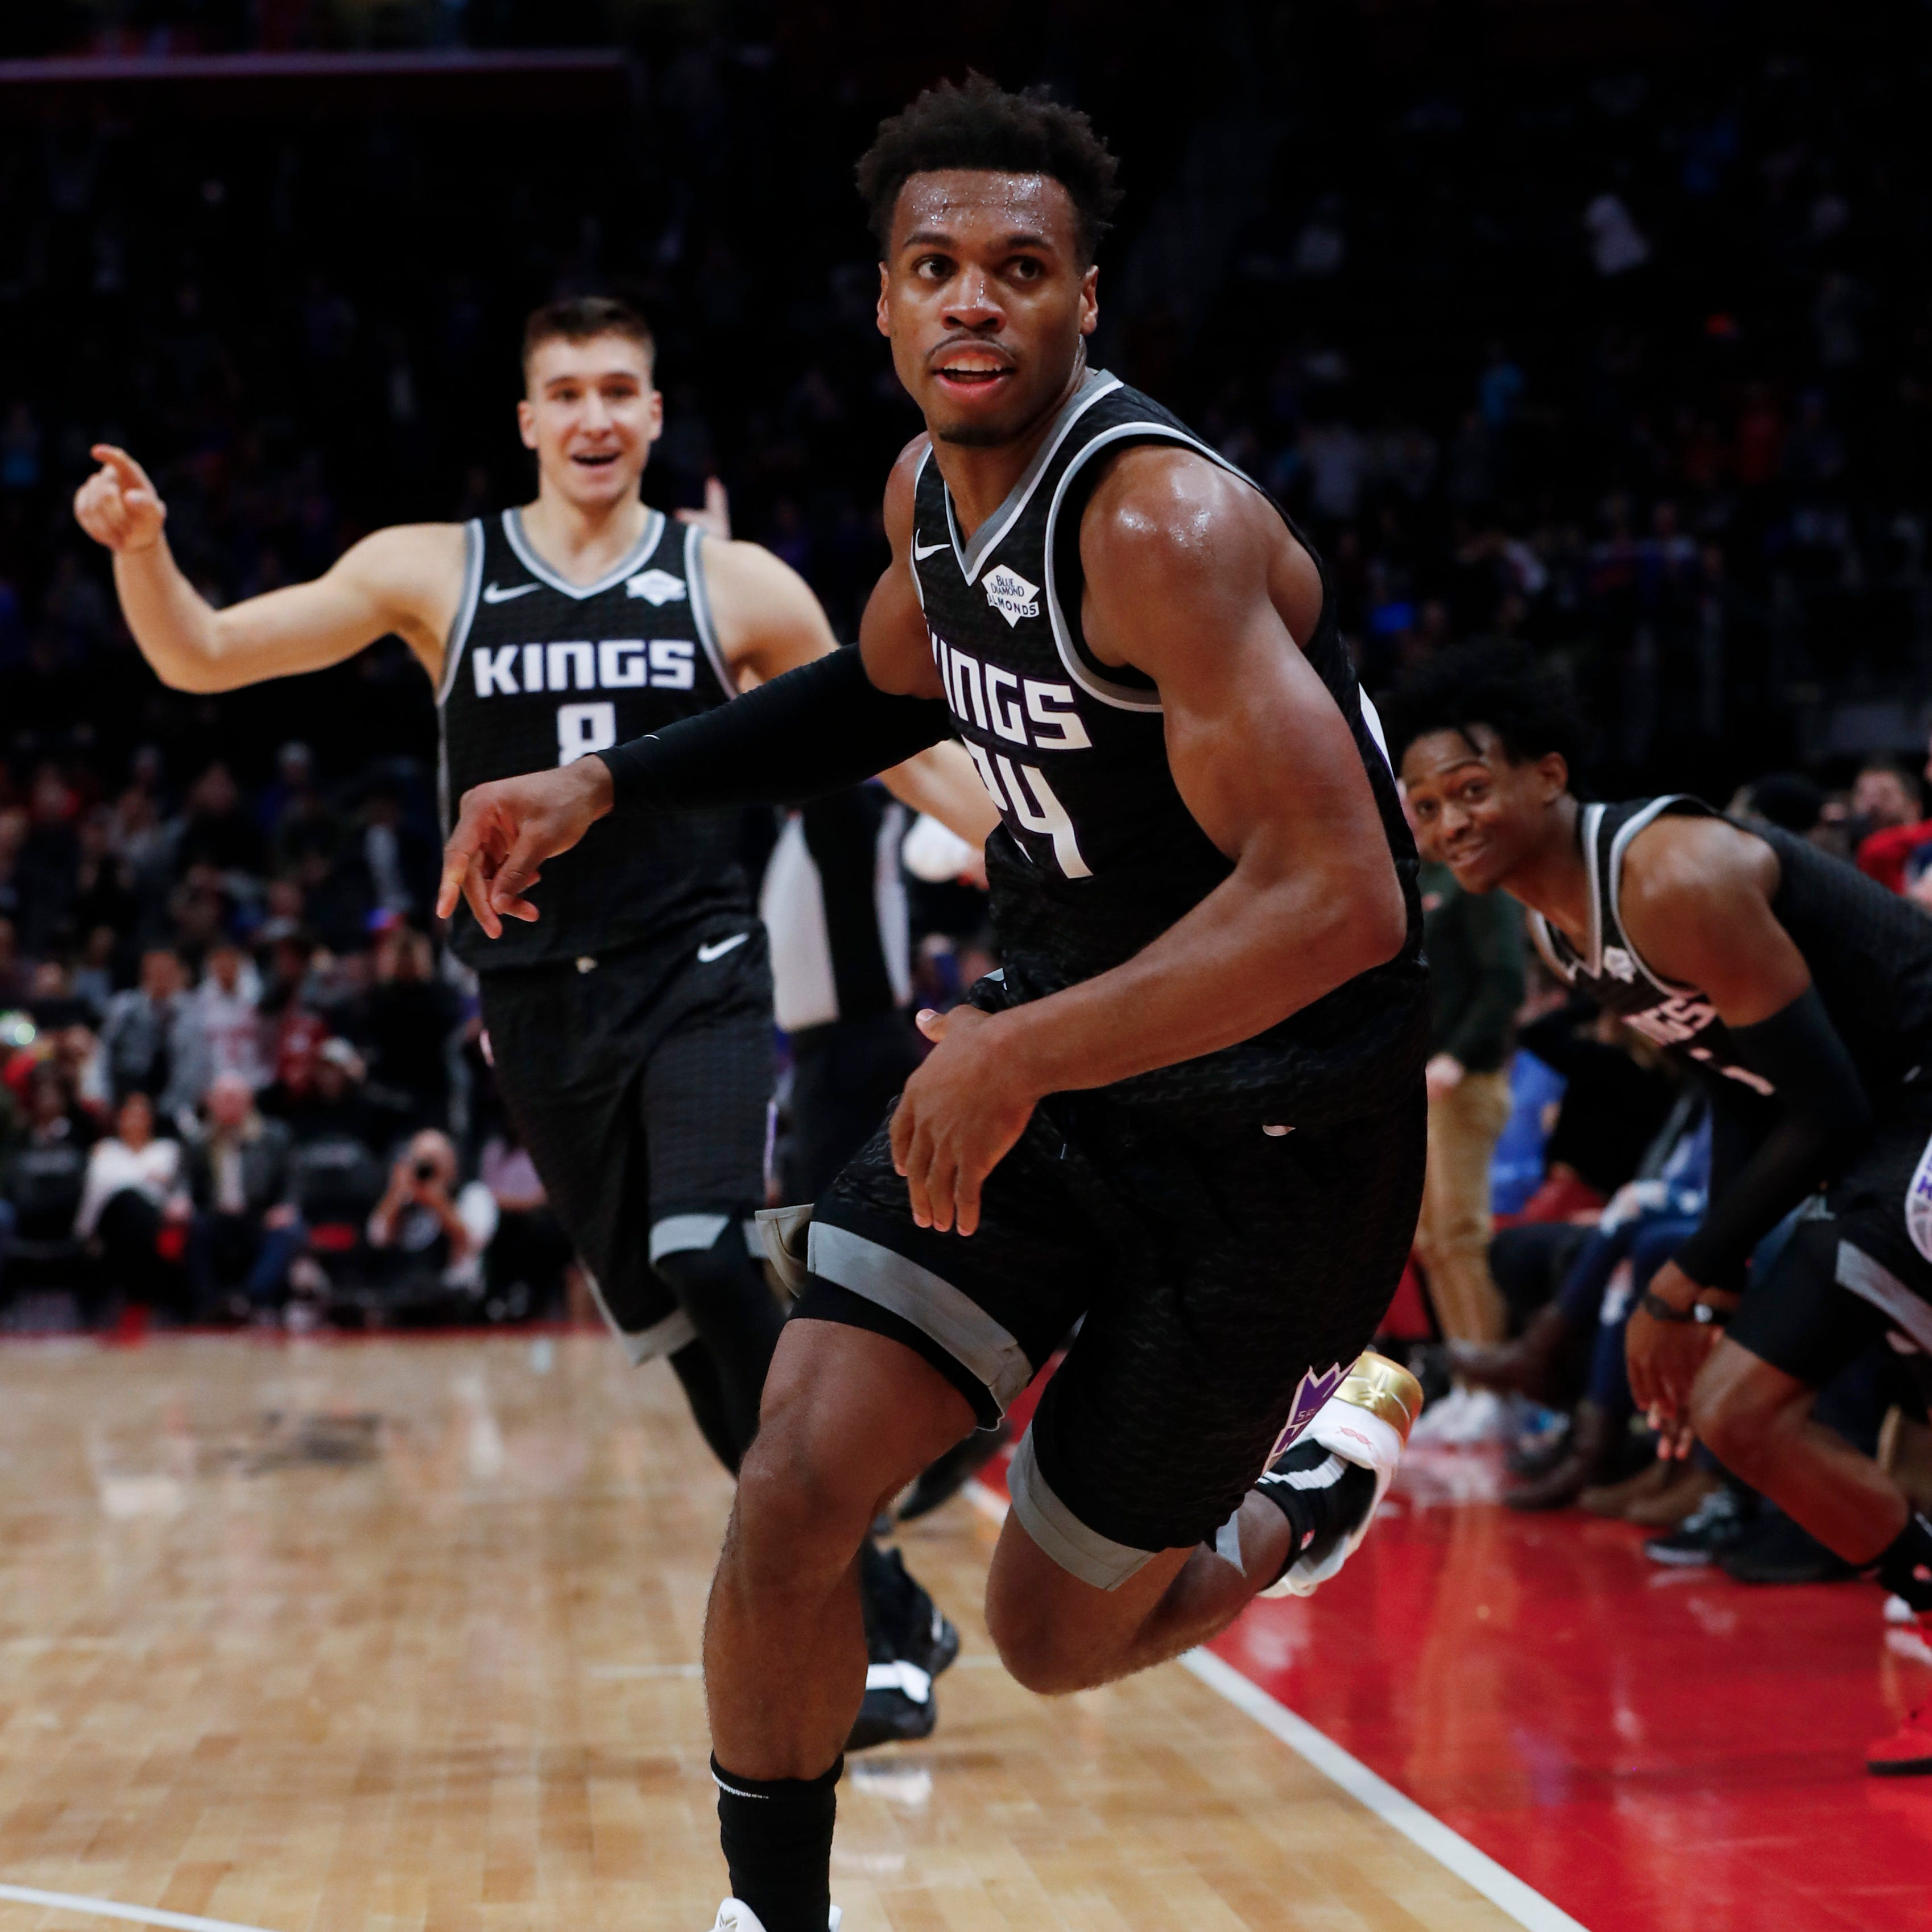 Hield's off-balance buzzer-beater ends Pistons' win streak